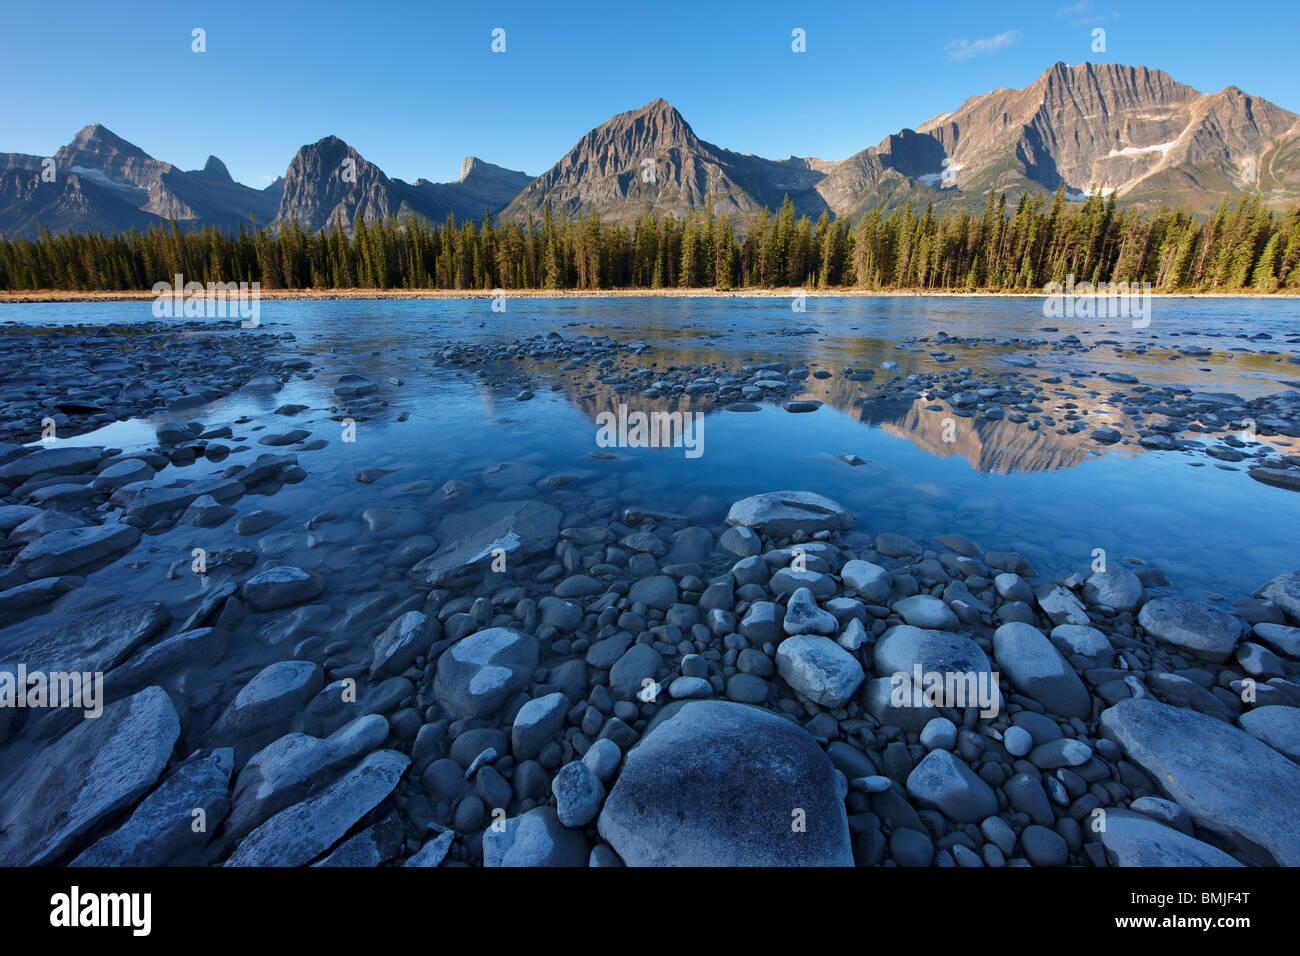 the Athabasca River with Mt Fryatt & Brussels Peak at dawn, Jasper National Park, Alberta, Canada - Stock Image